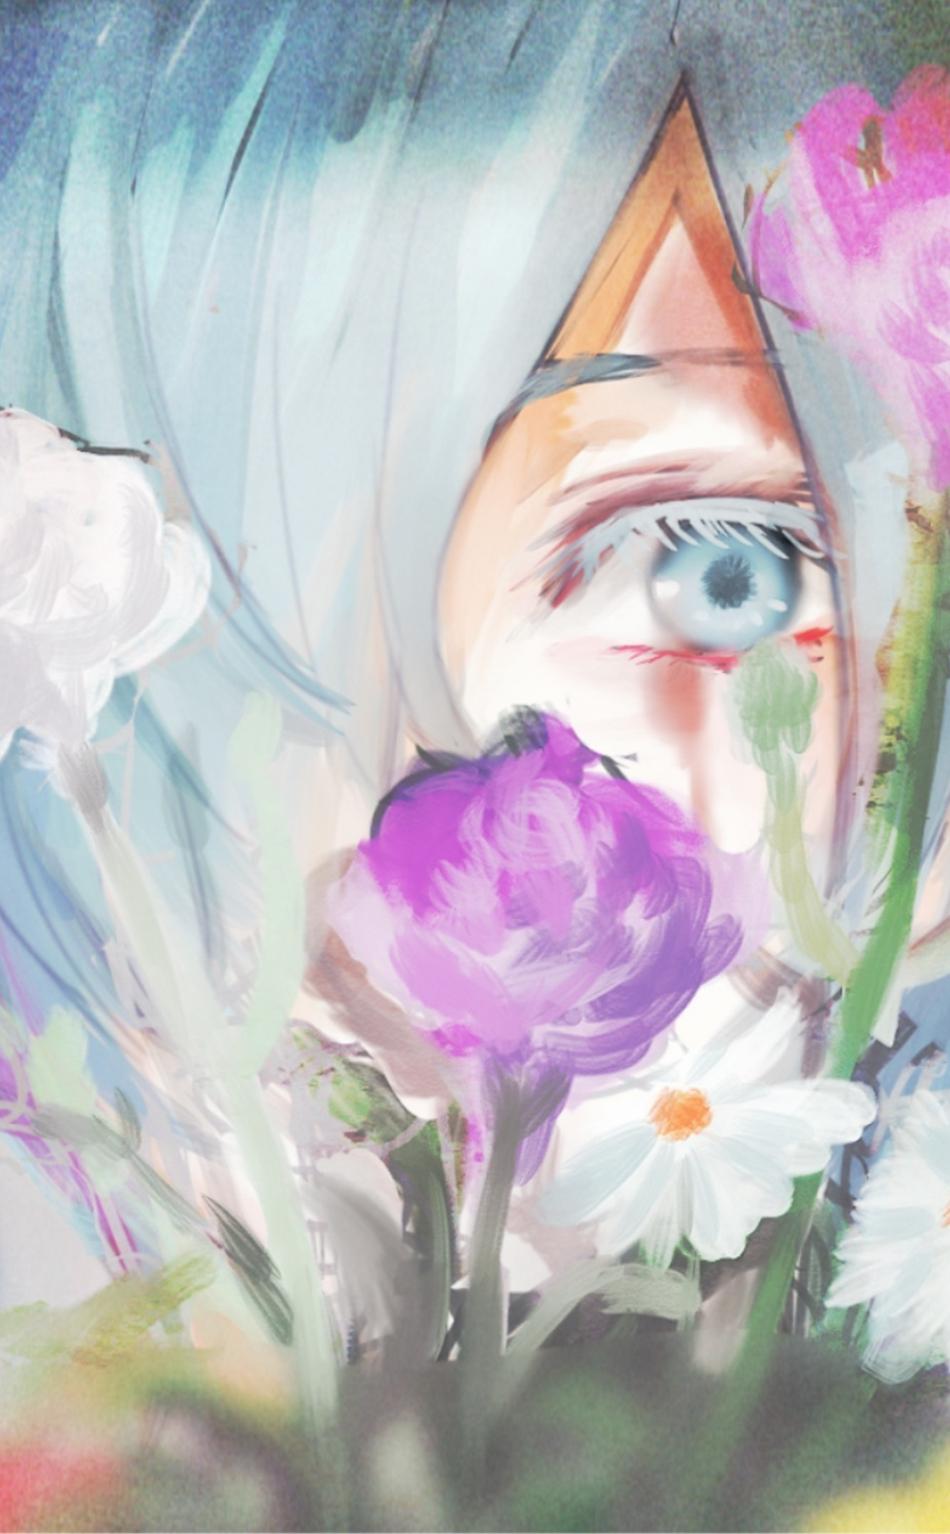 Download 950x1534 Wallpaper Beautiful Touka Kirishima Tokyo